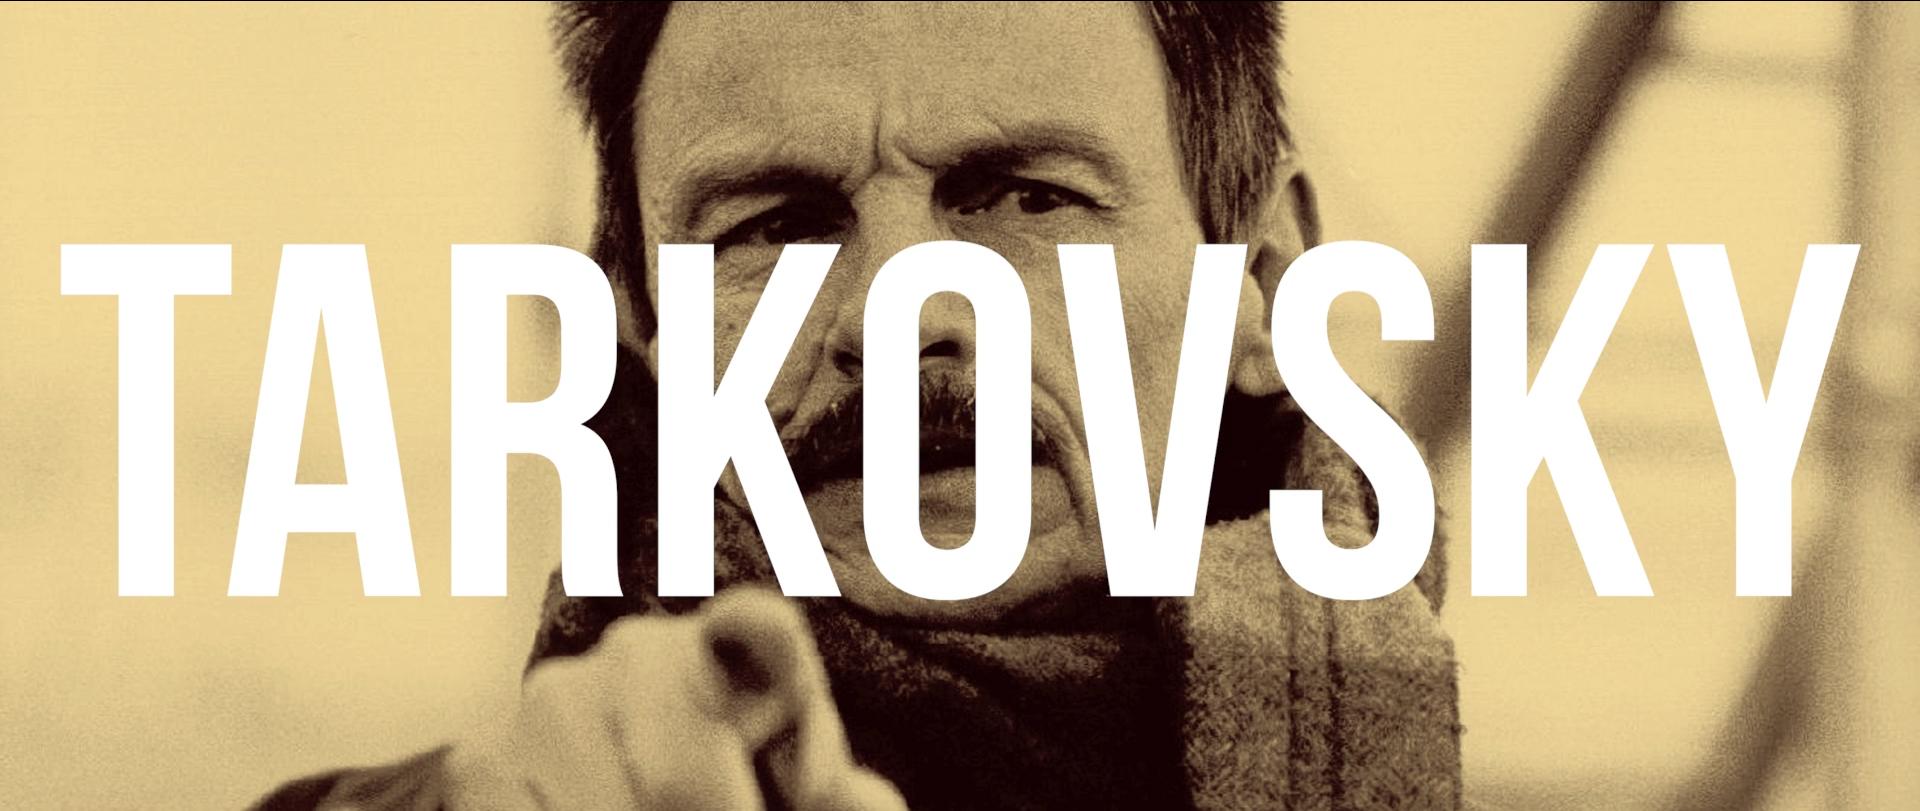 """Auteur in Space"": A Video Essay on How Andrei Tarkovsky's Solaris Transcends Science Fiction"